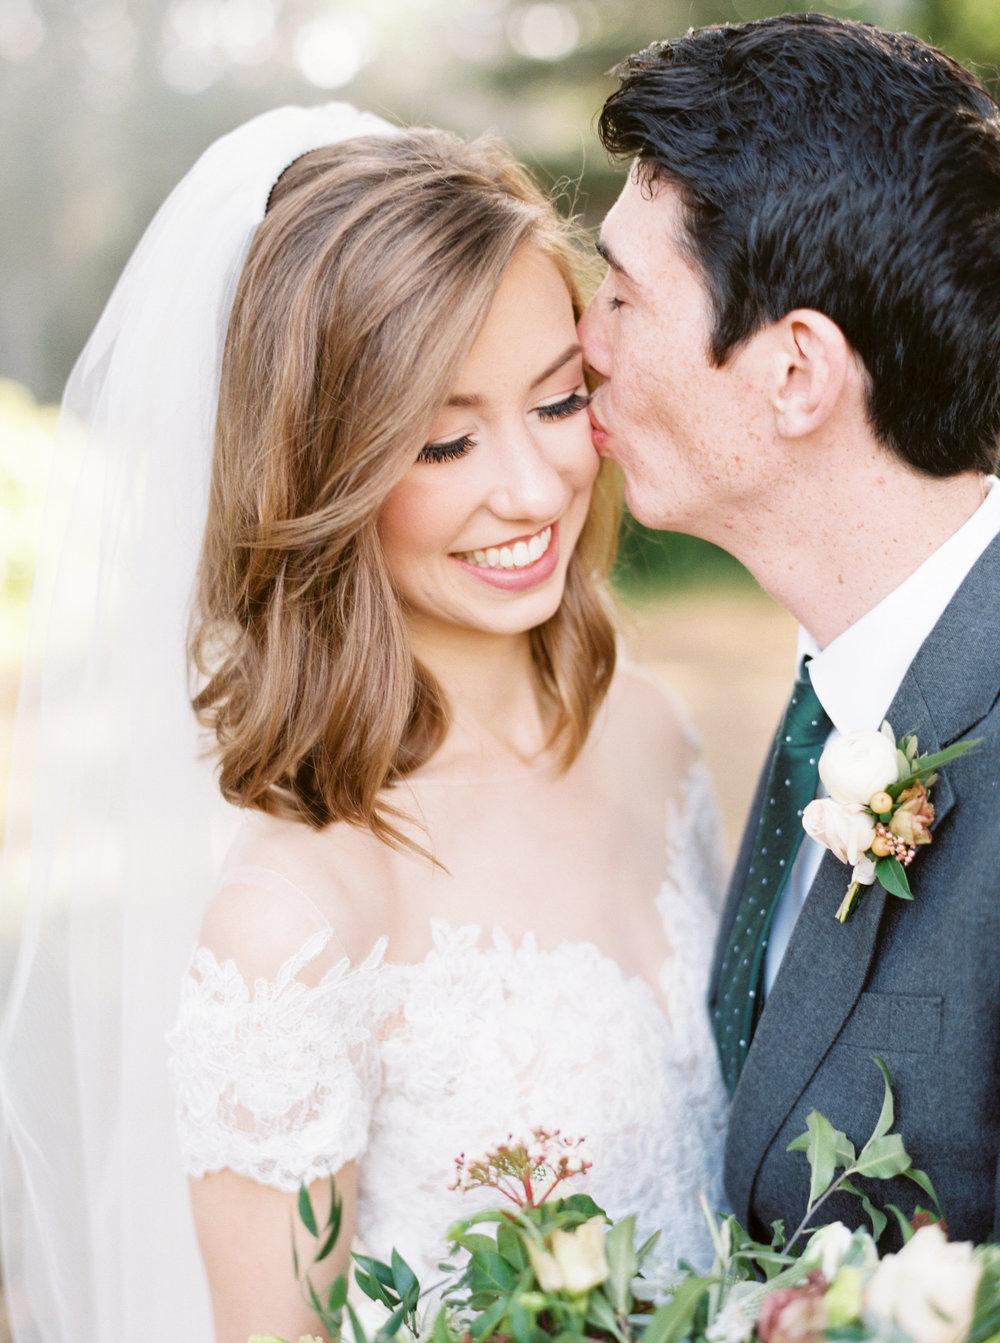 Log-cabin-wedding-in-presidio-san-francisco-california-desintation-wedding-photography-58.jpg